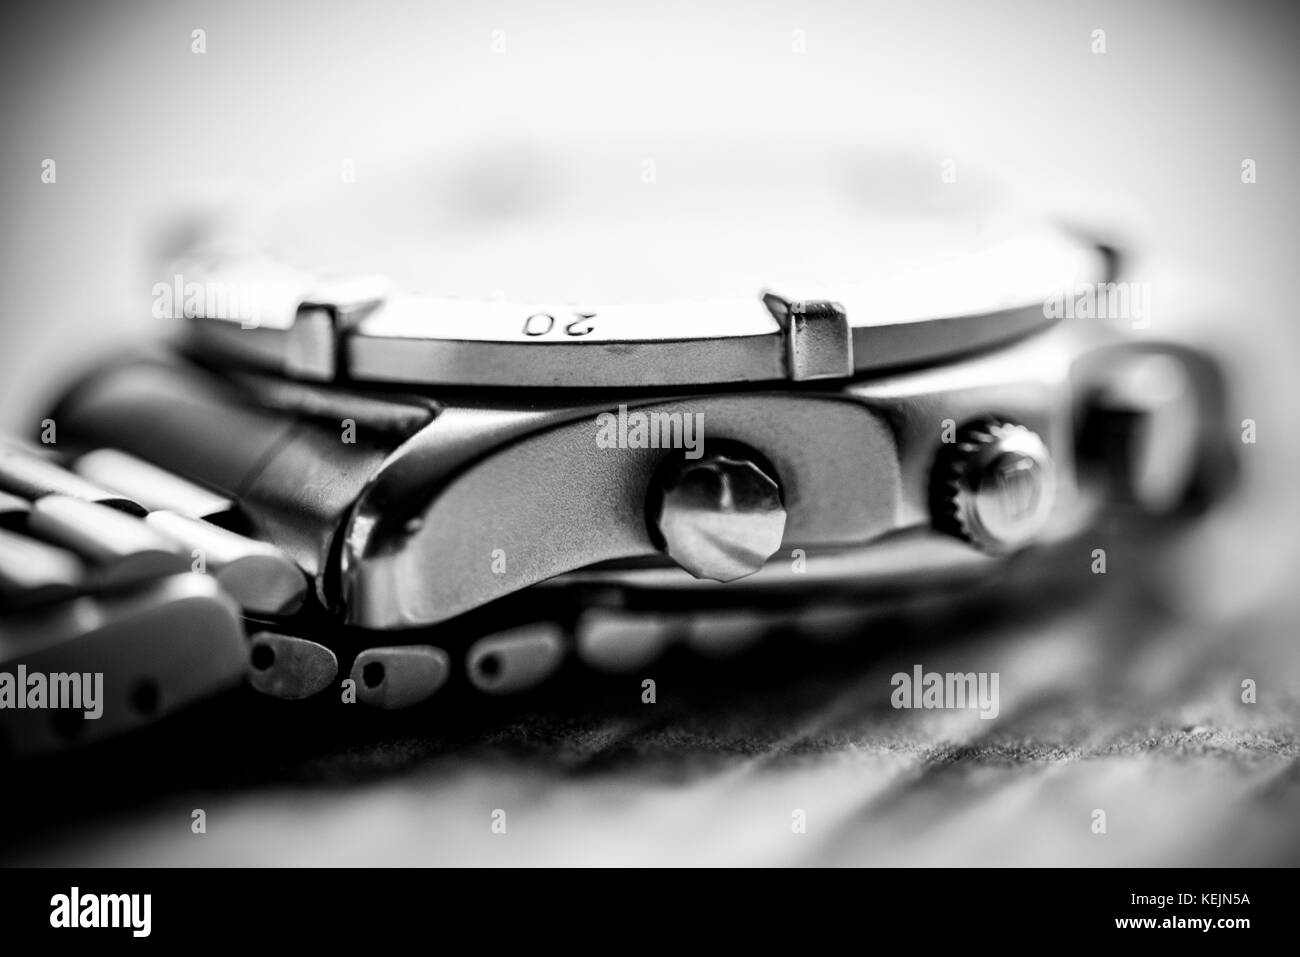 Macro shot of wrist watch - Stock Image